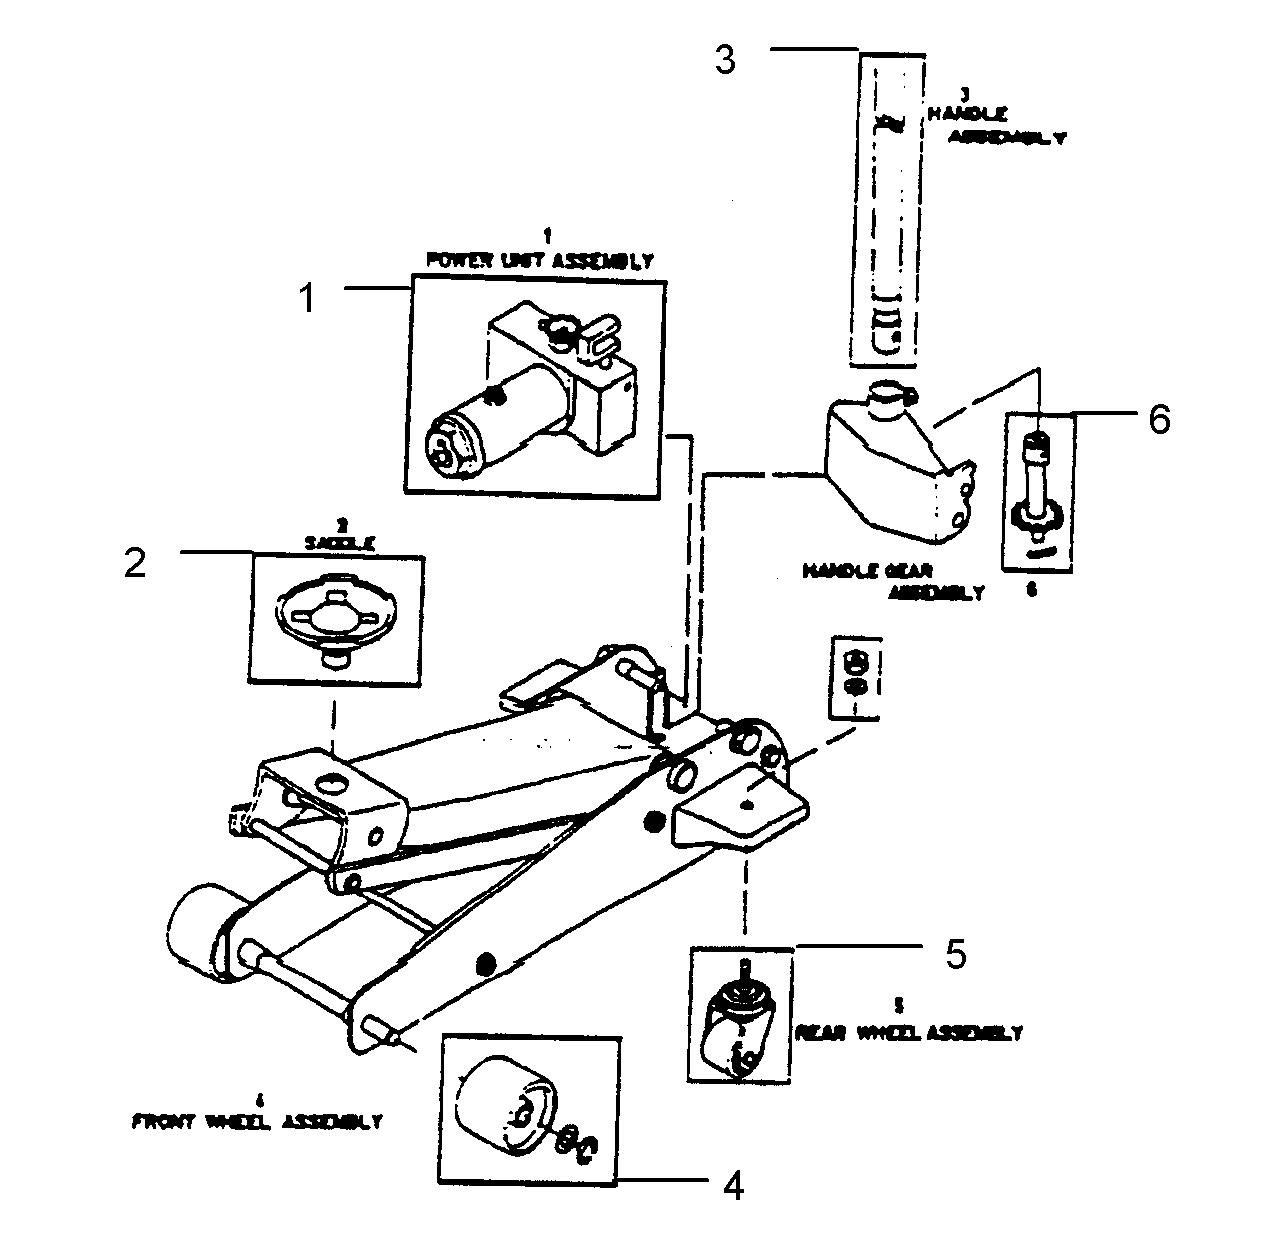 Trrs Jack Wiring Diagram Manual Guide